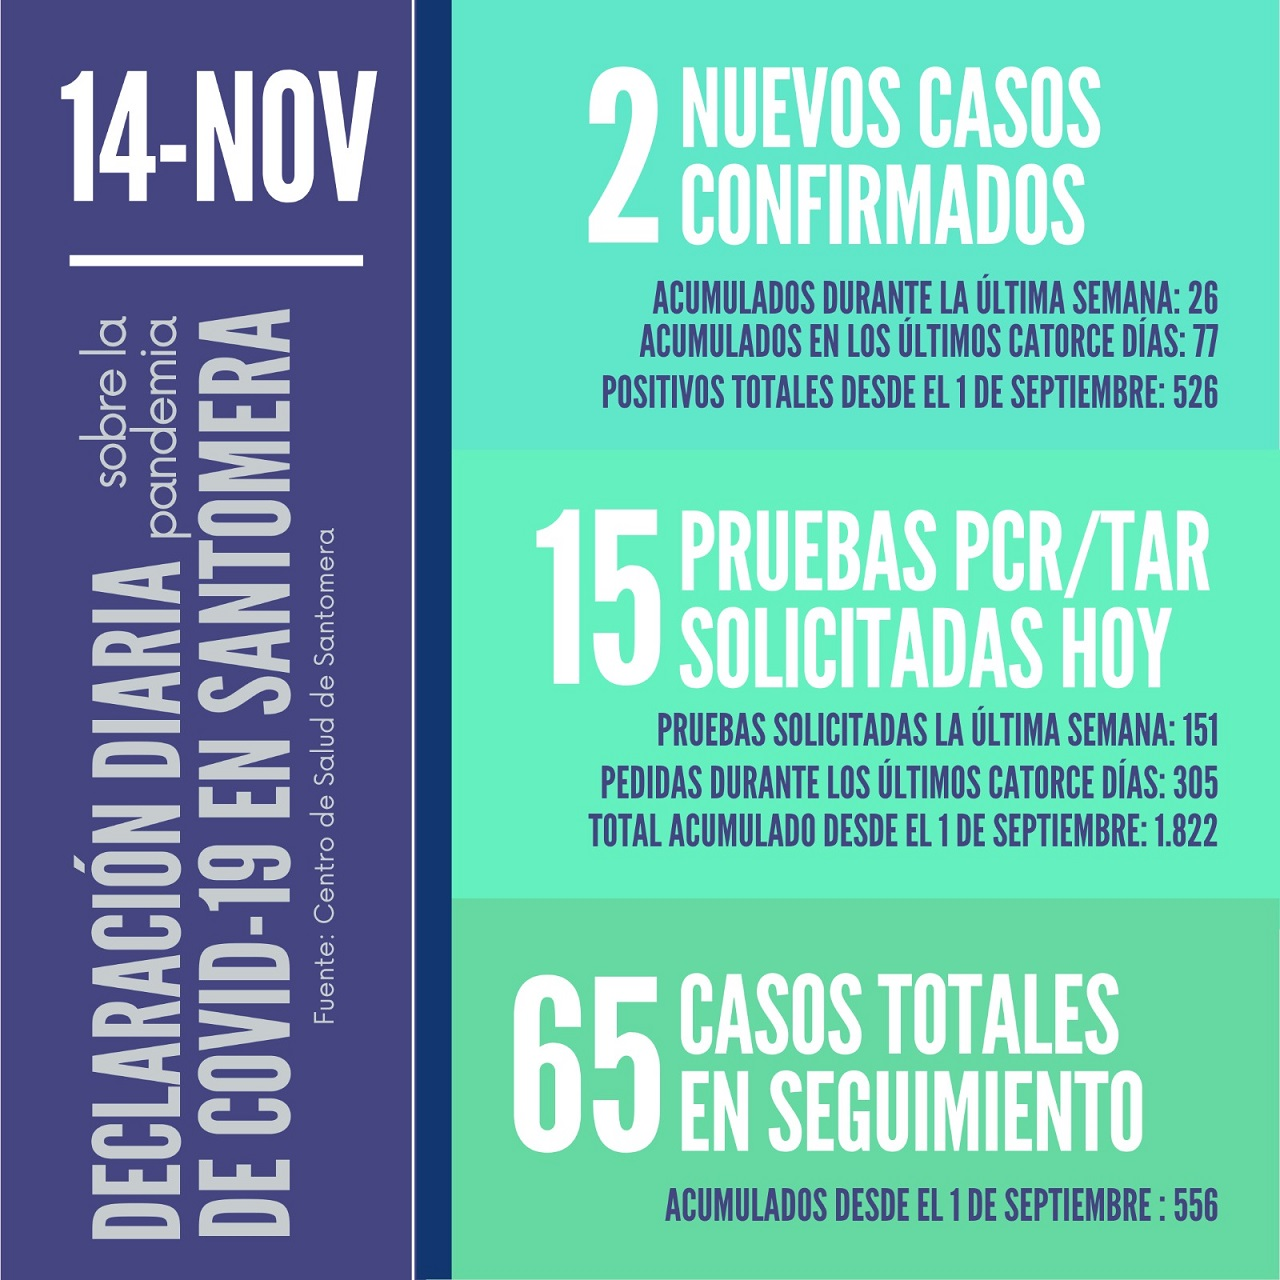 20201114_Datos COVID-19 Santomera